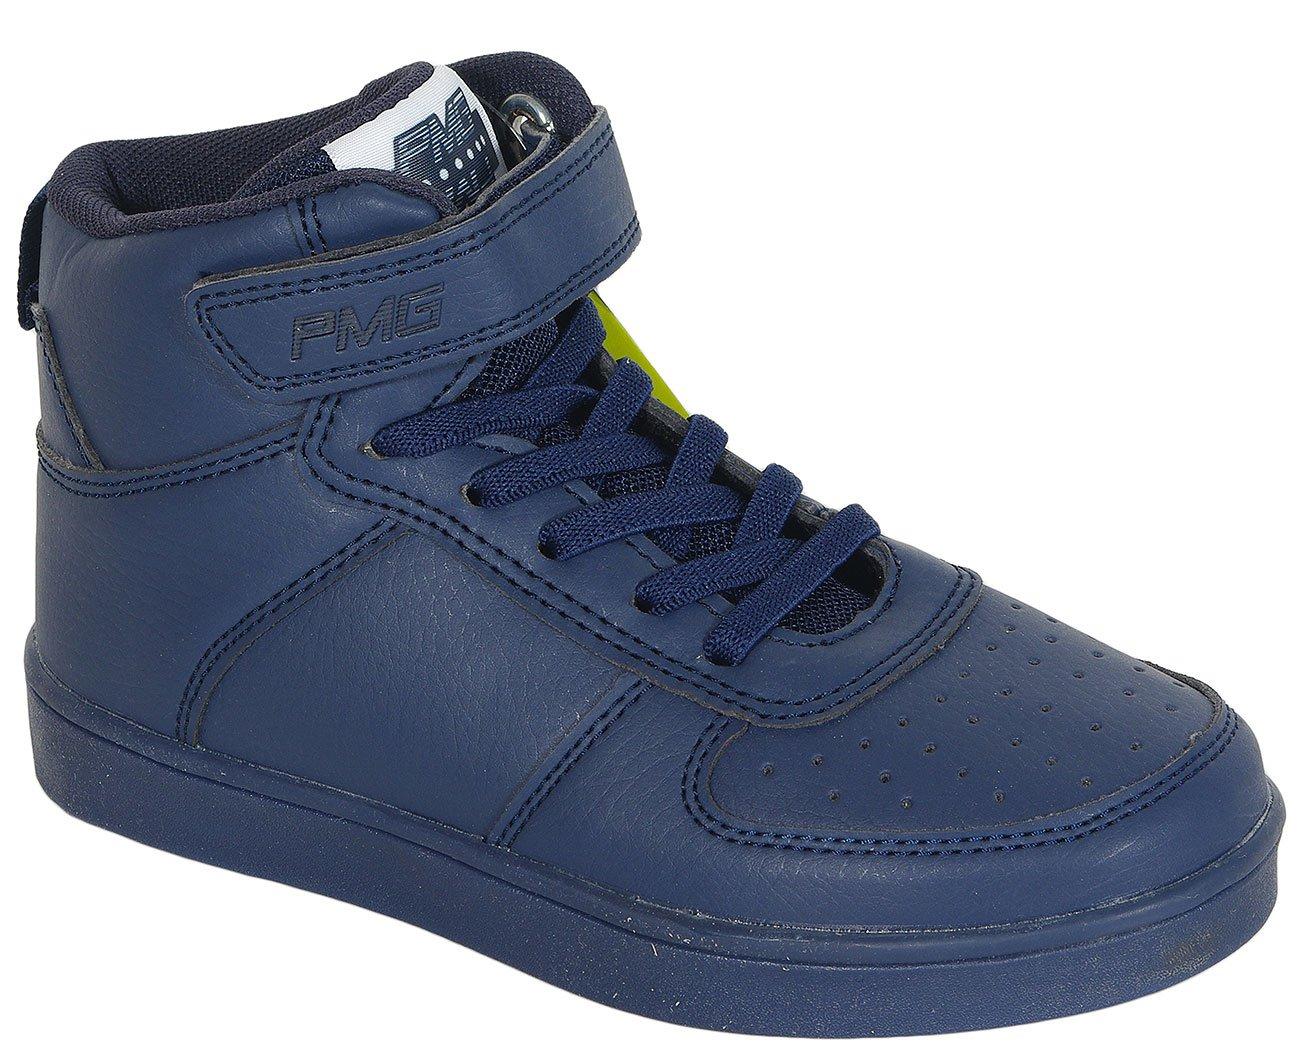 Primigi B&G Total Light Bottalato Pu Navy sneakers